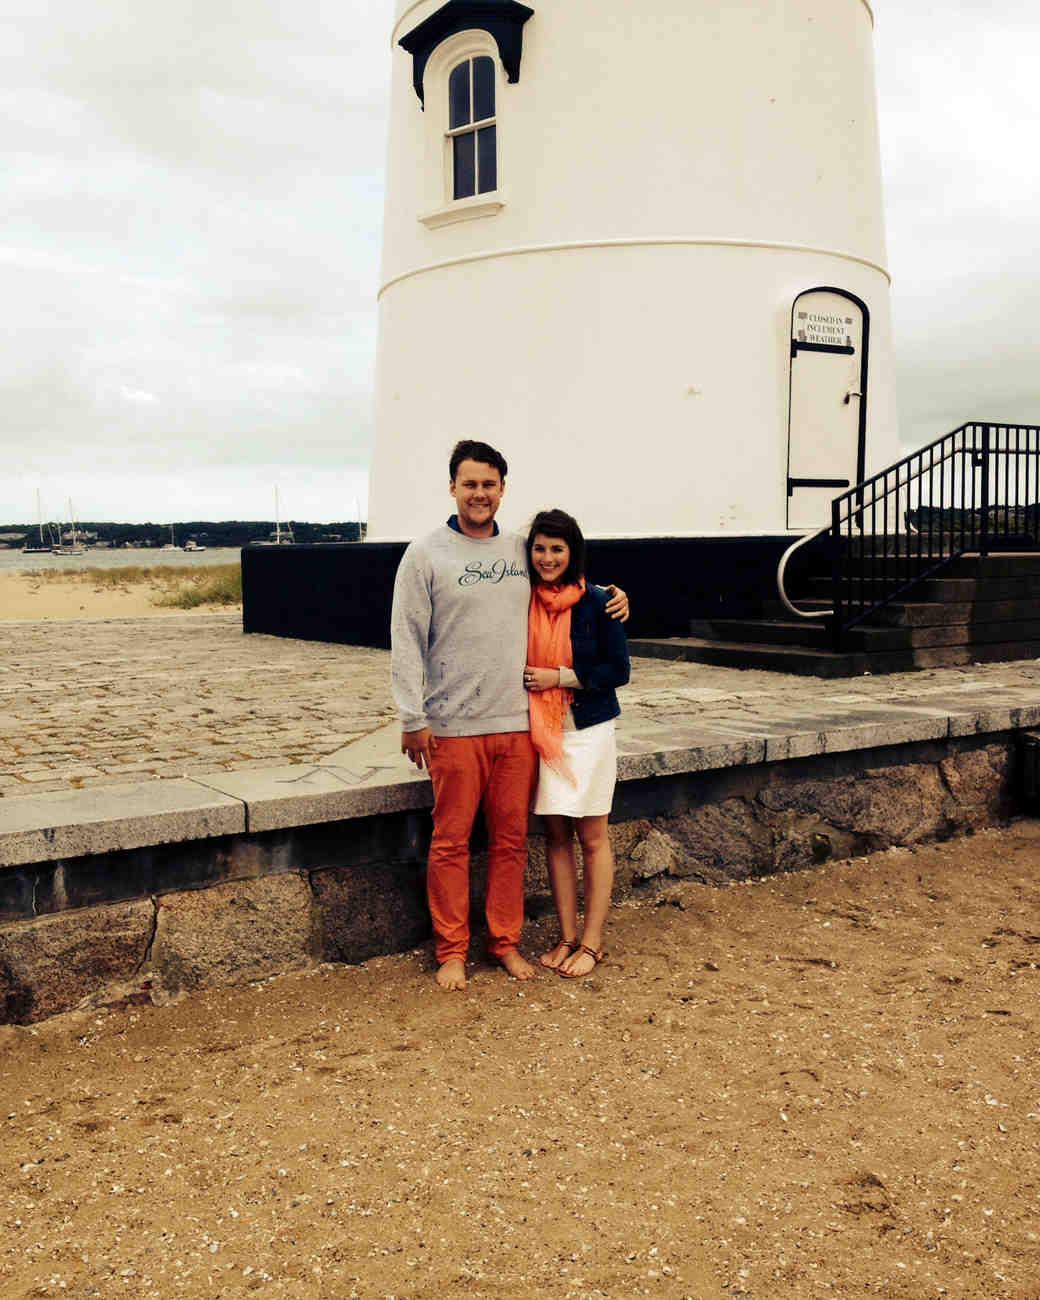 romantic-places-edgartown-lighthouse-massachusetts-0215.jpg